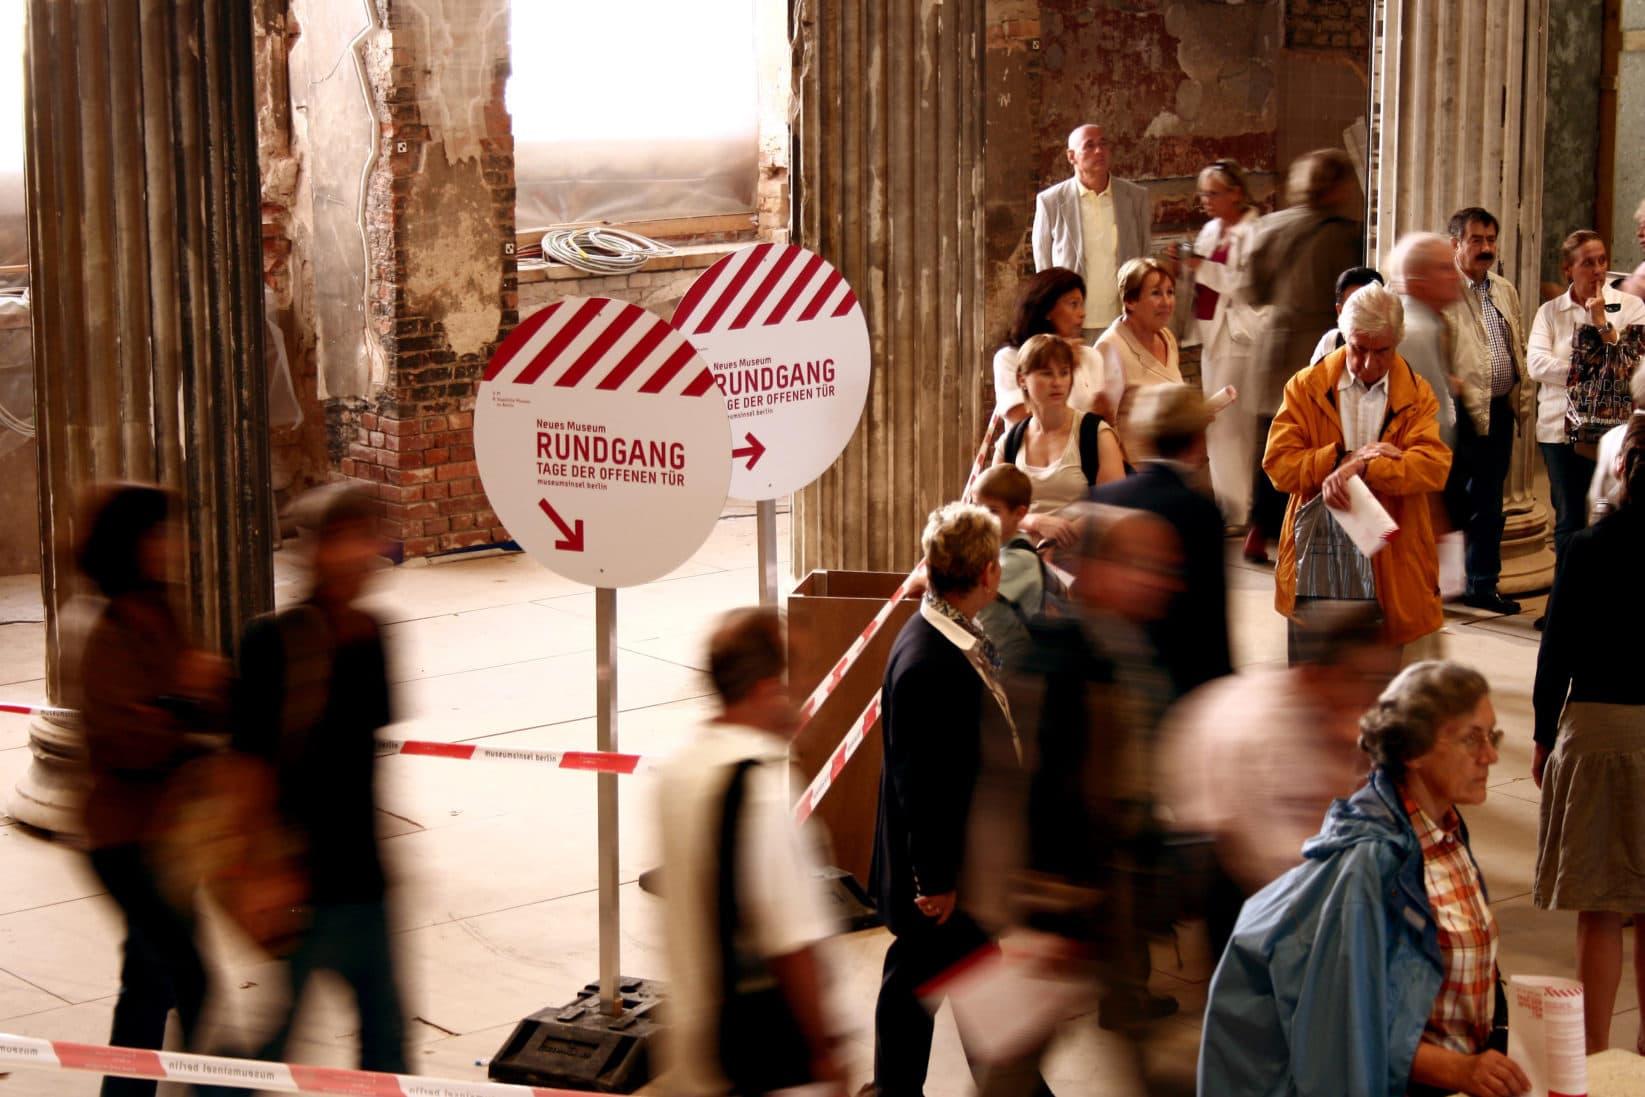 Museumsinsel Berlin Baustellenkommunikation Innen Rundgang